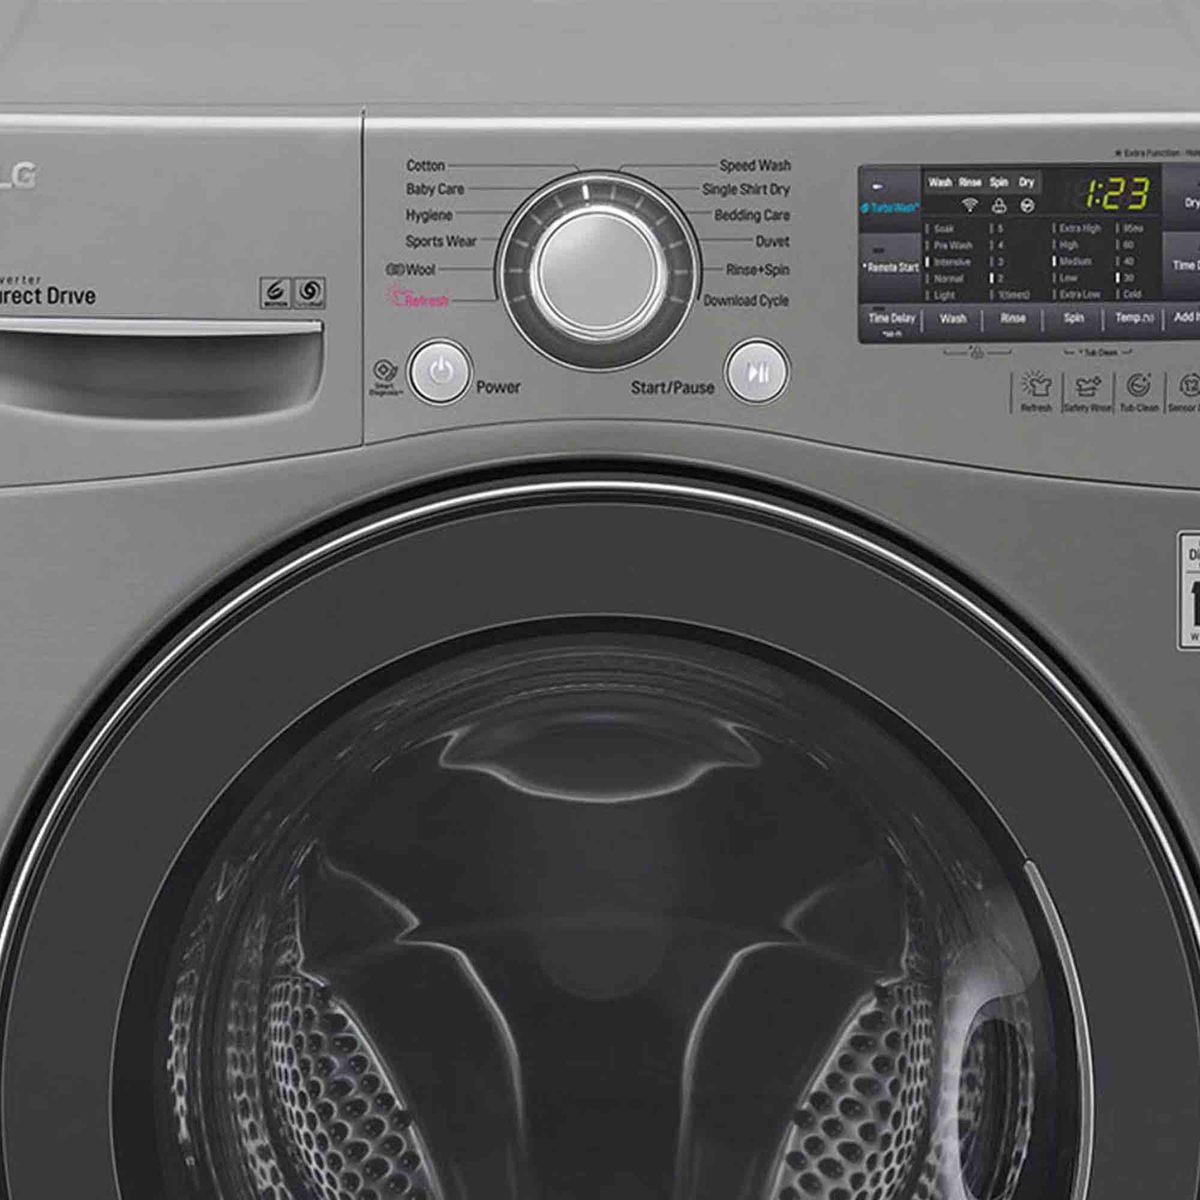 Buy LG Front Load Washer & Dryer F0K6DMK2S2 13/8Kg - Washer & Dryers